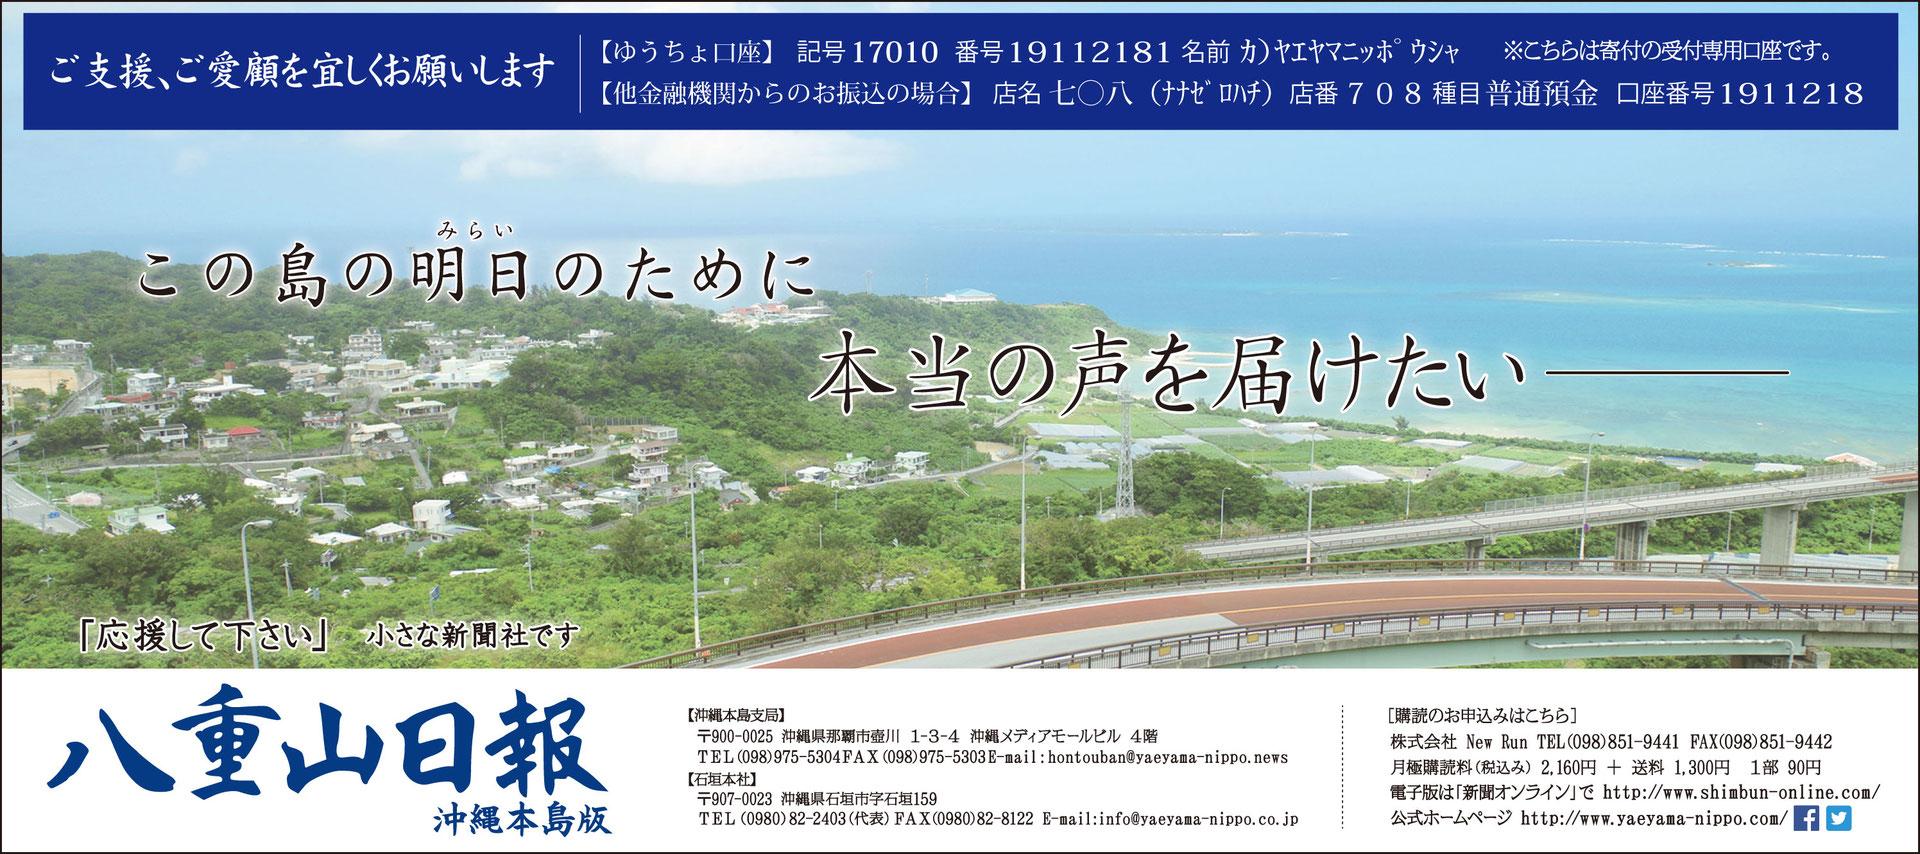 5d9e43aee0 サイトマップ - 八重山日報公式 旧ホームページ